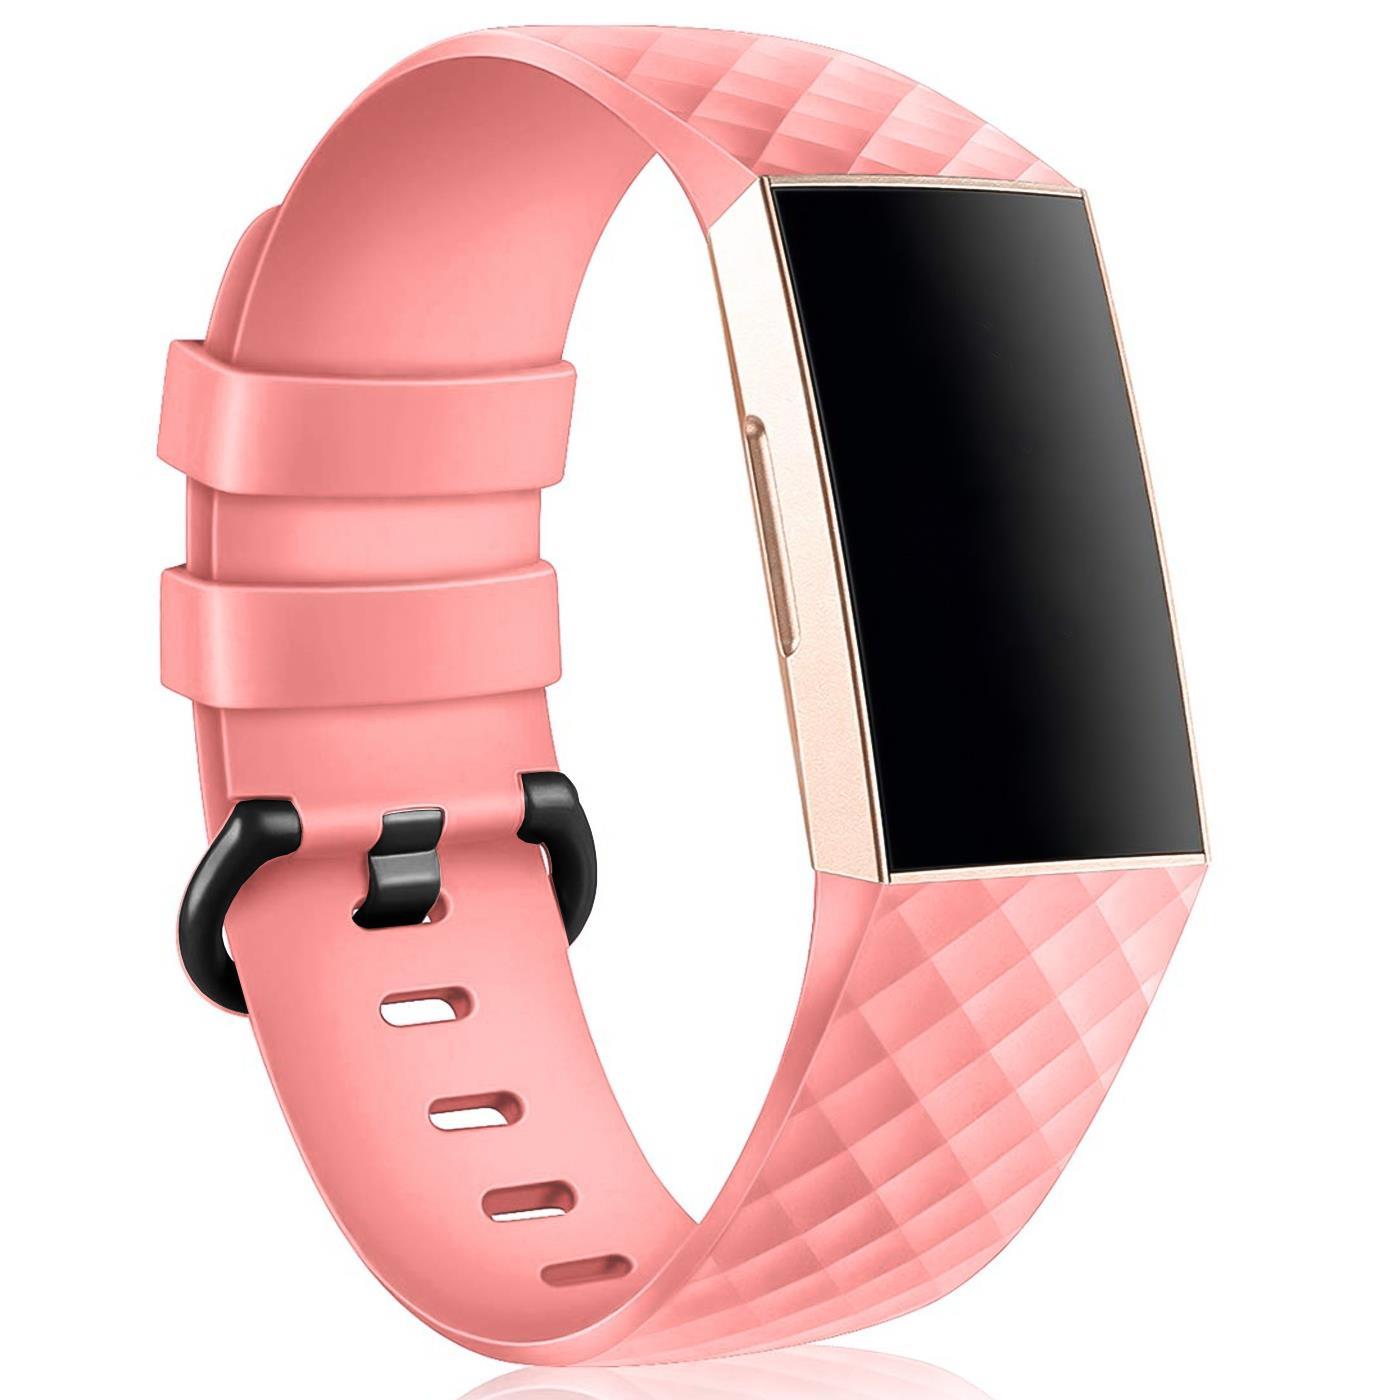 Für Fitbit Charge 3 Nylon Sport Armband Ersatzarmband Uhrenarmband Uhr Strap